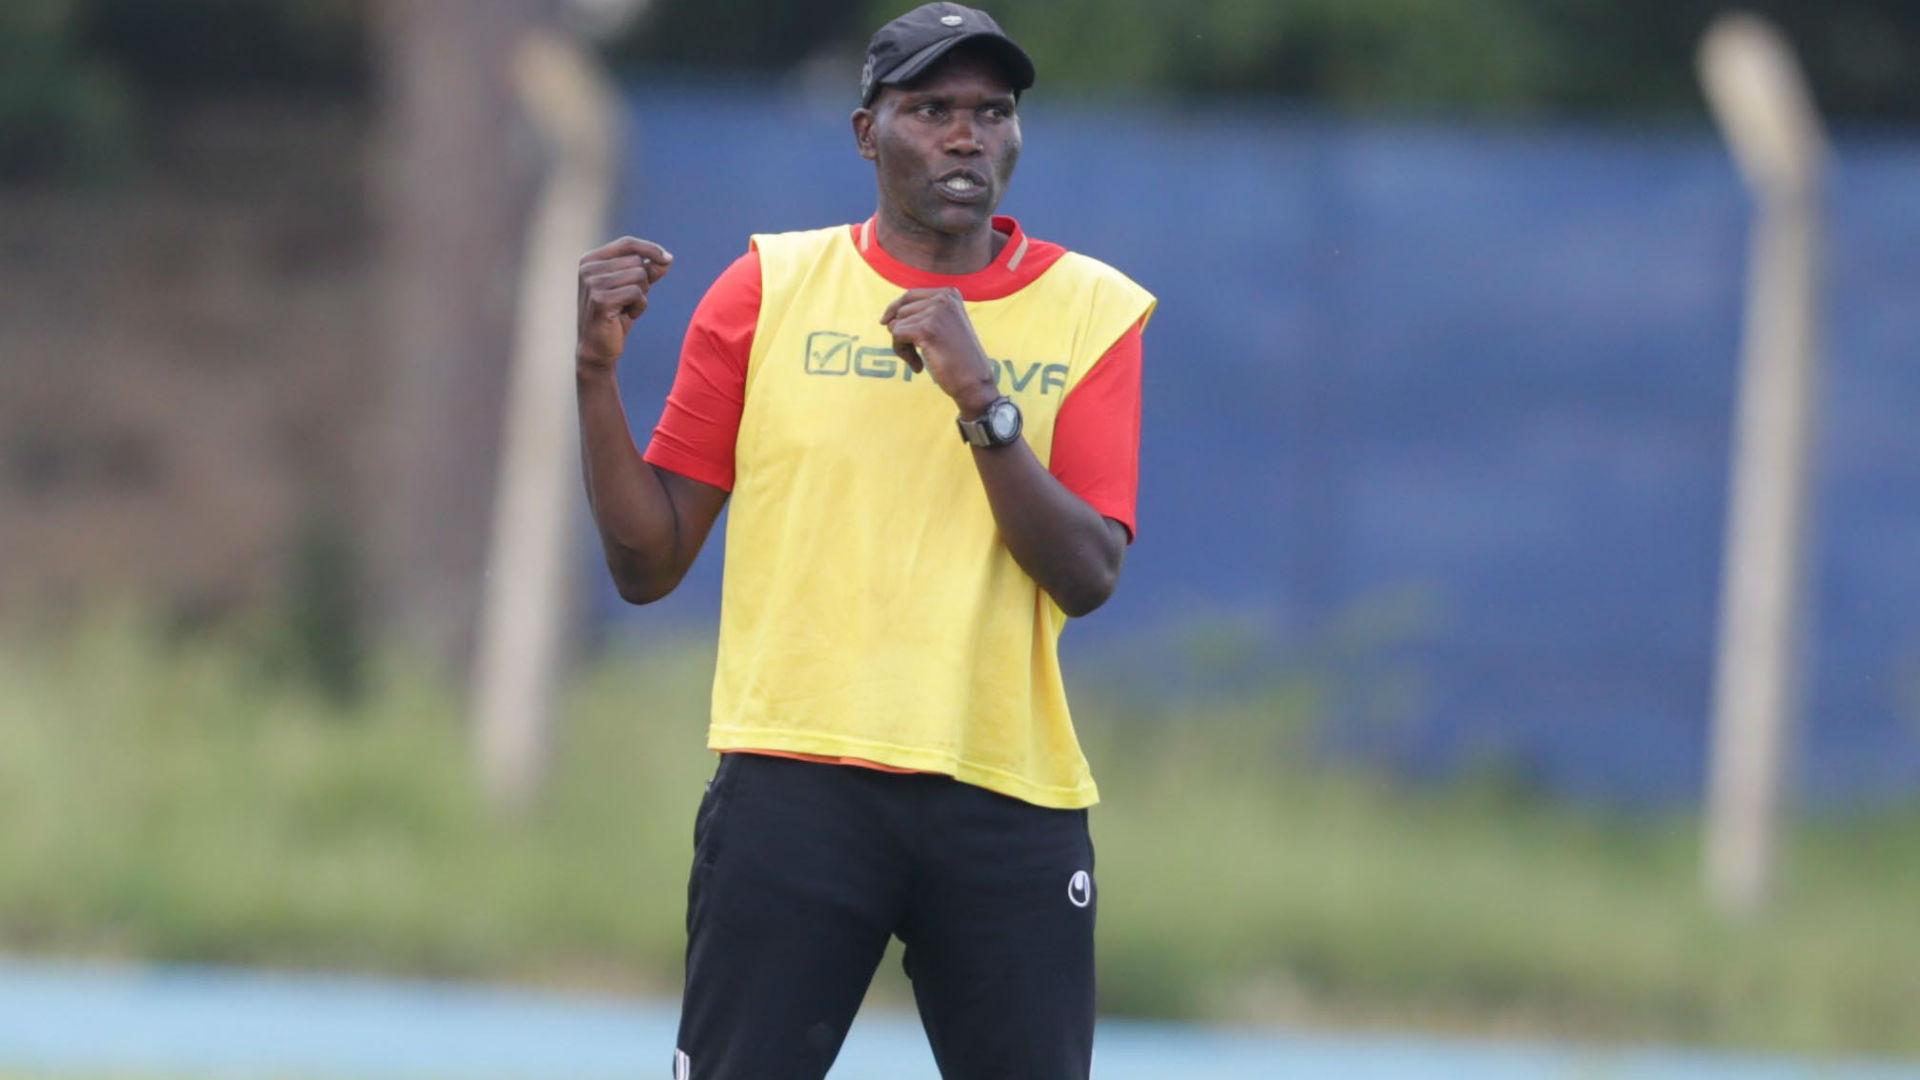 Wazito FC will be very easy for Posta Rangers to beat - Omollo